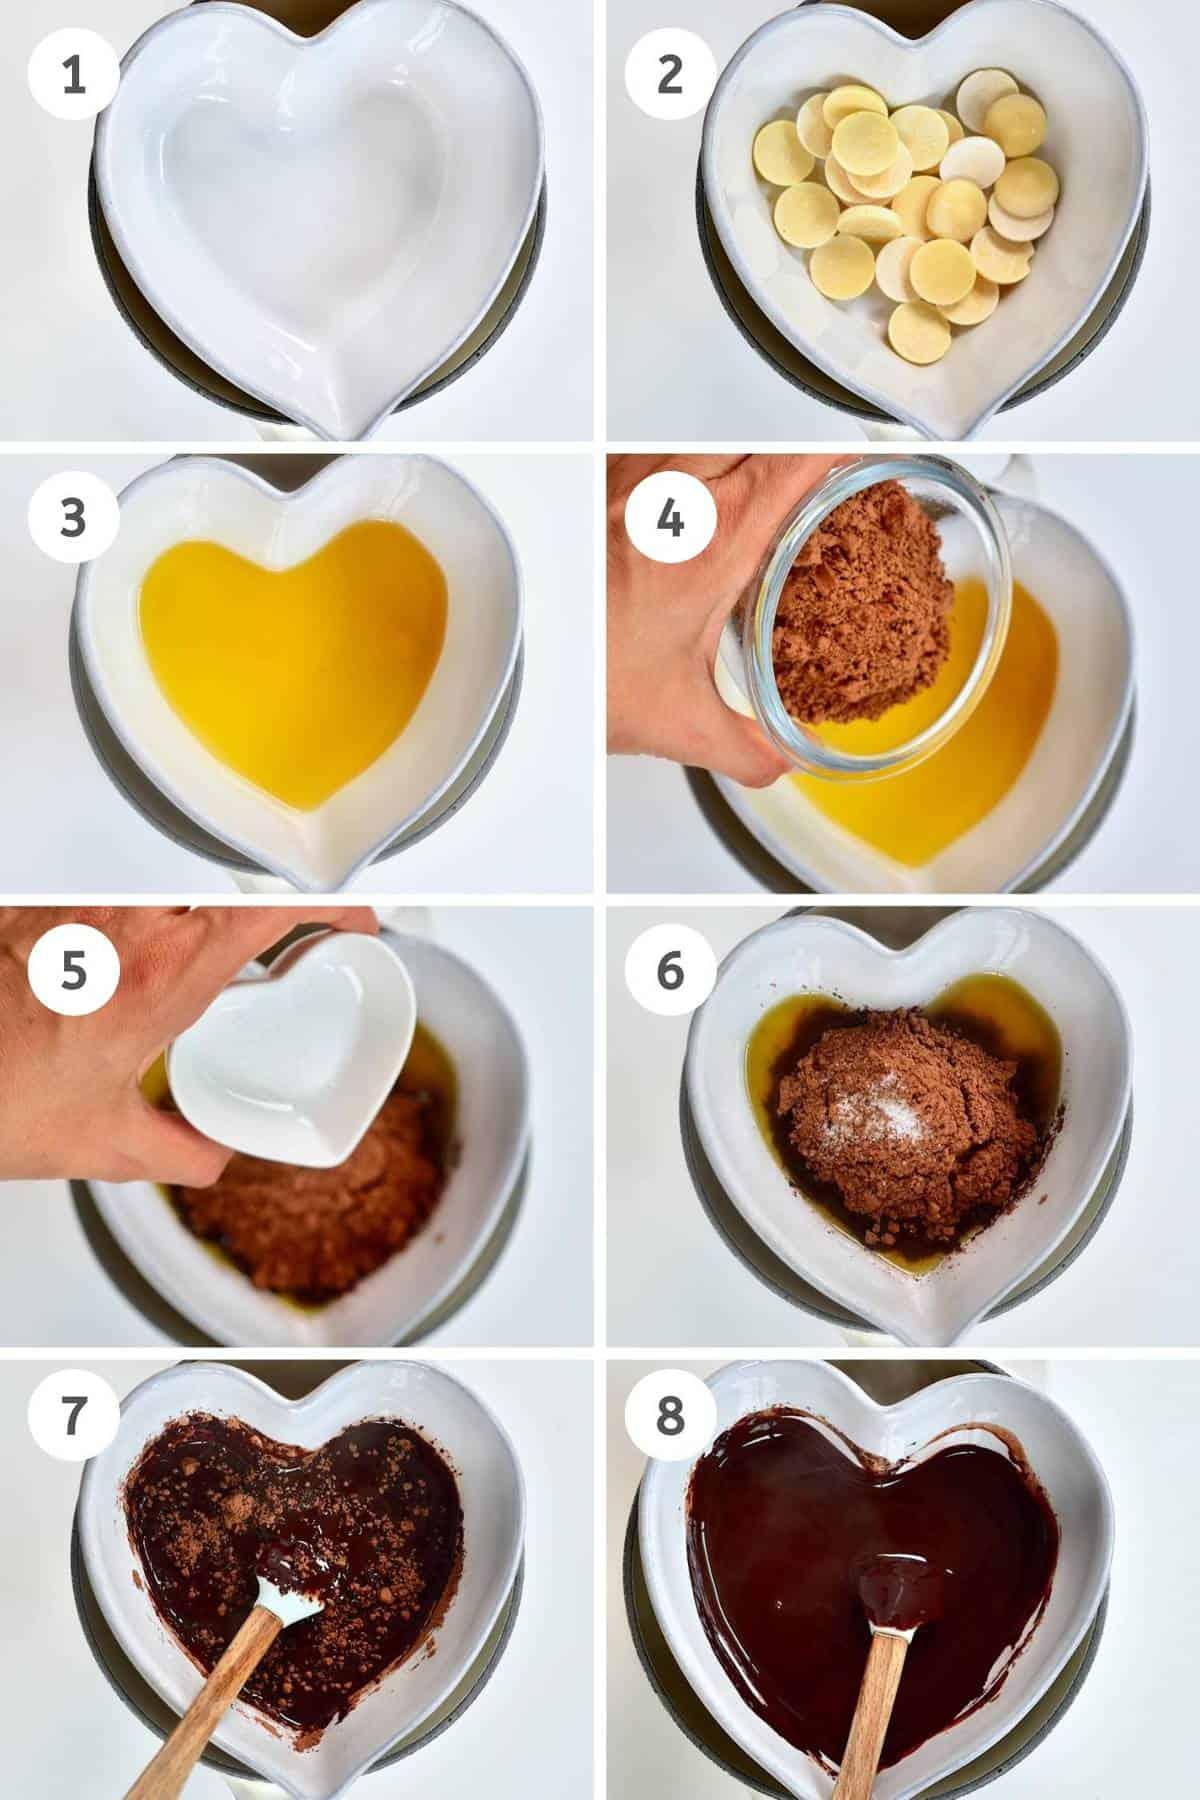 Collage of making dark chocolate steps